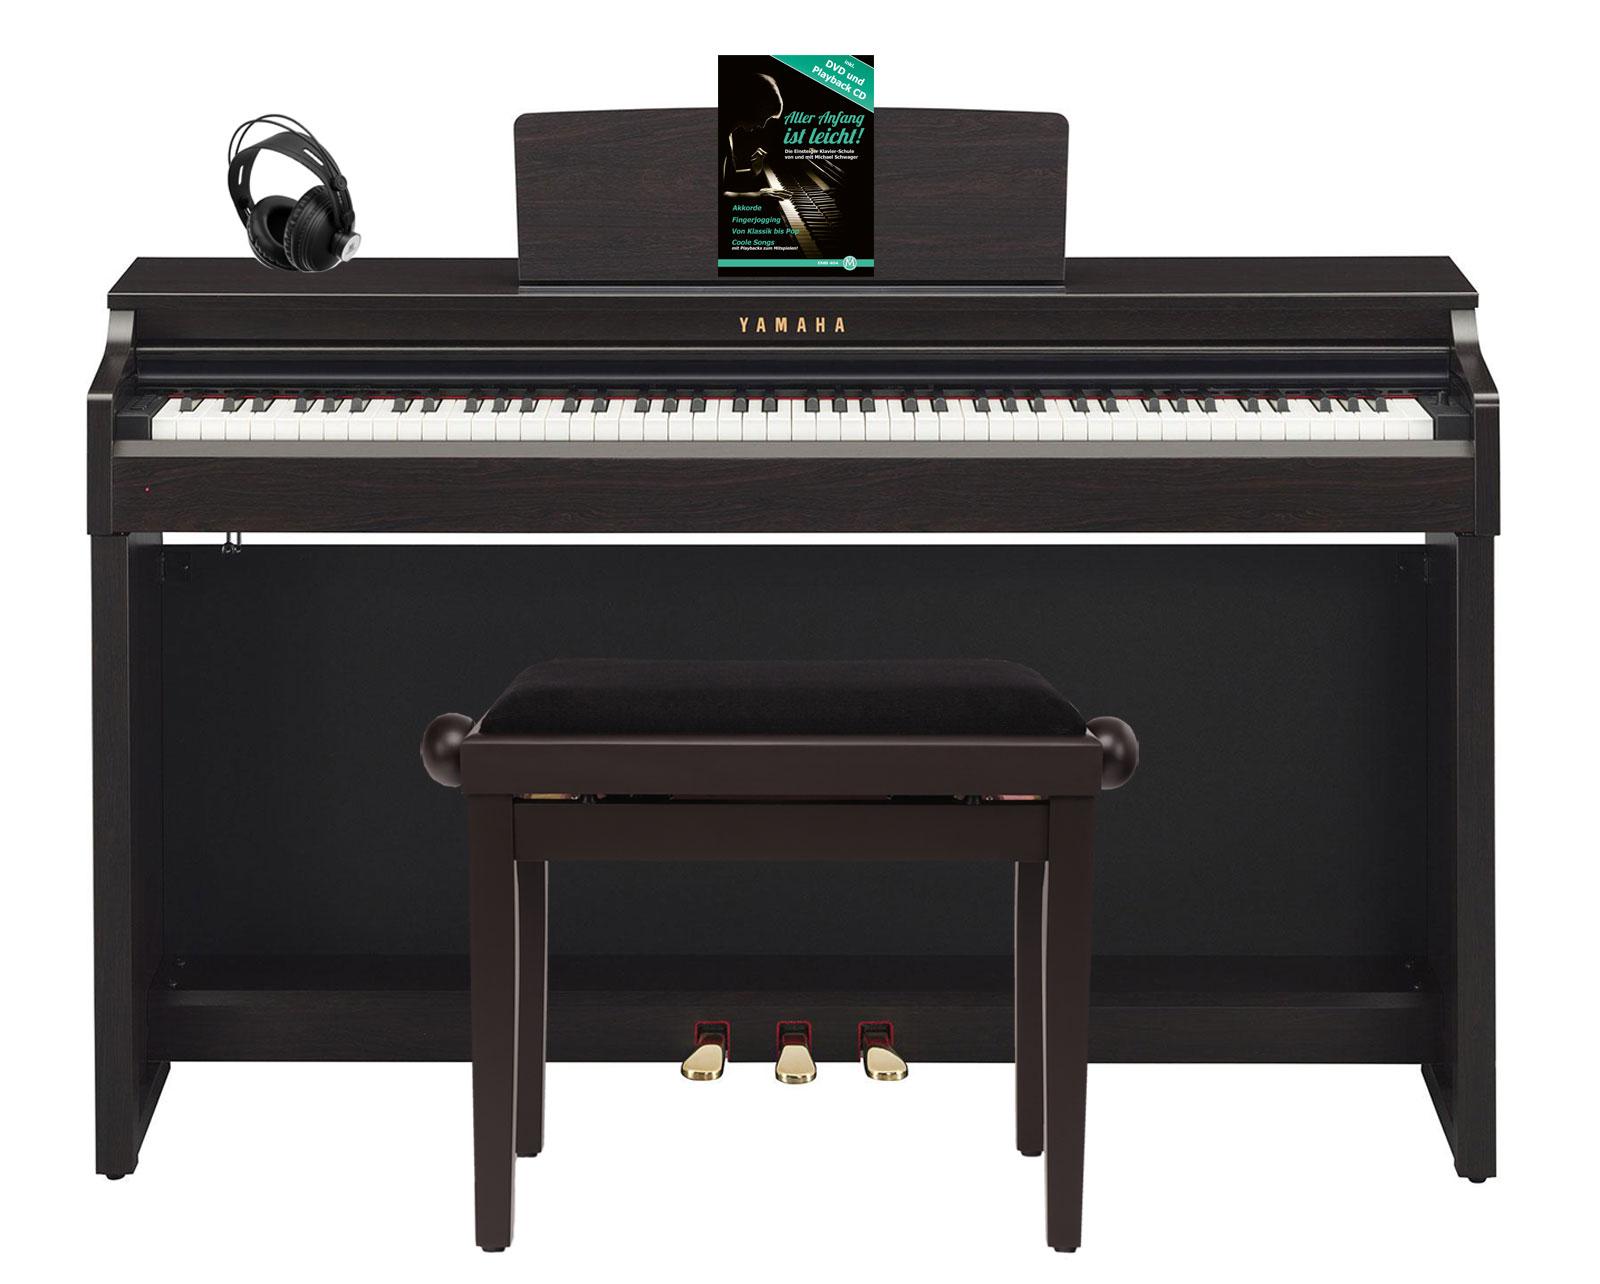 Yamaha clp 625 r digitalpiano rosenholz set mit kopfh rer for Yamaha clp 625